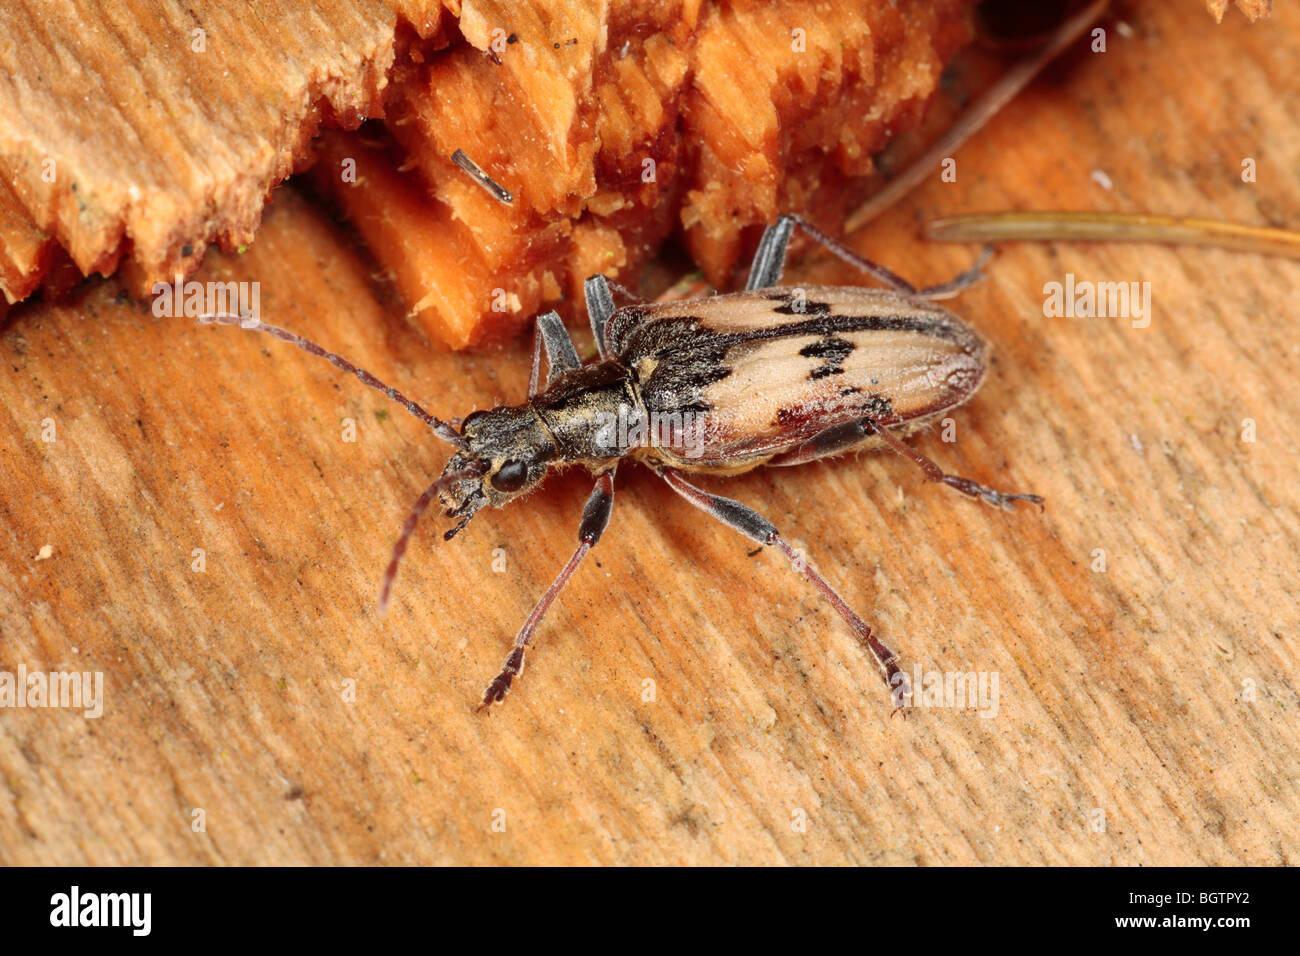 Due fasce di Longhorn beetle (Rhagium bifasciatum) su legno morto. Powys, Galles. Immagini Stock